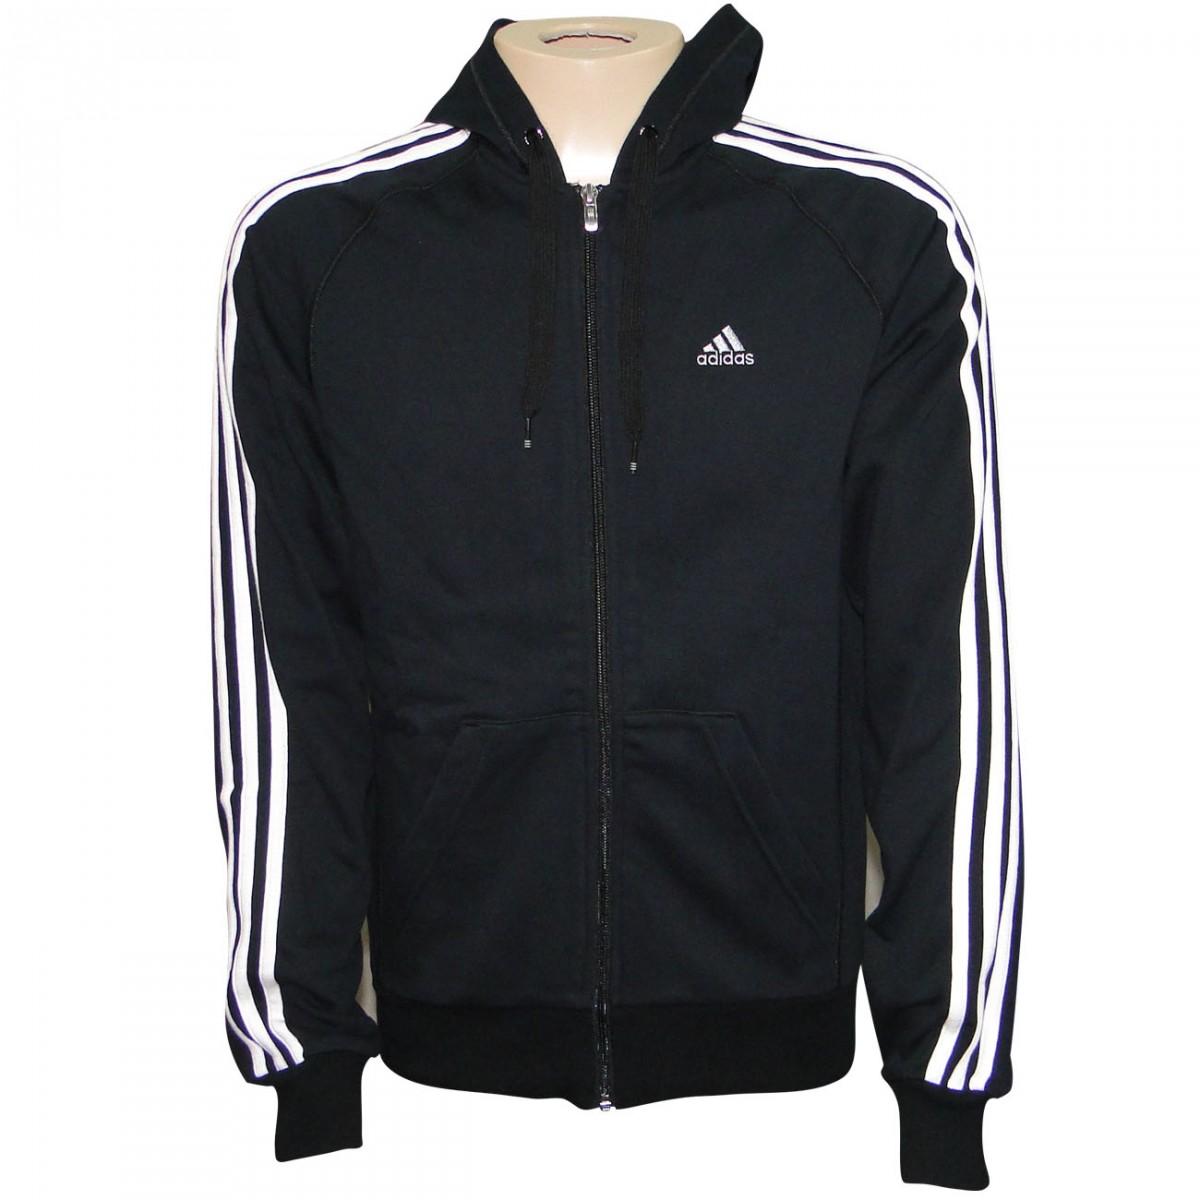 0501cff07 Jaqueta Adidas Ess 3s Fz Hood 0802 - PRETO/BRANCO - Chuteira Nike, Adidas.  Sandalias Femininas. Sandy Calçados